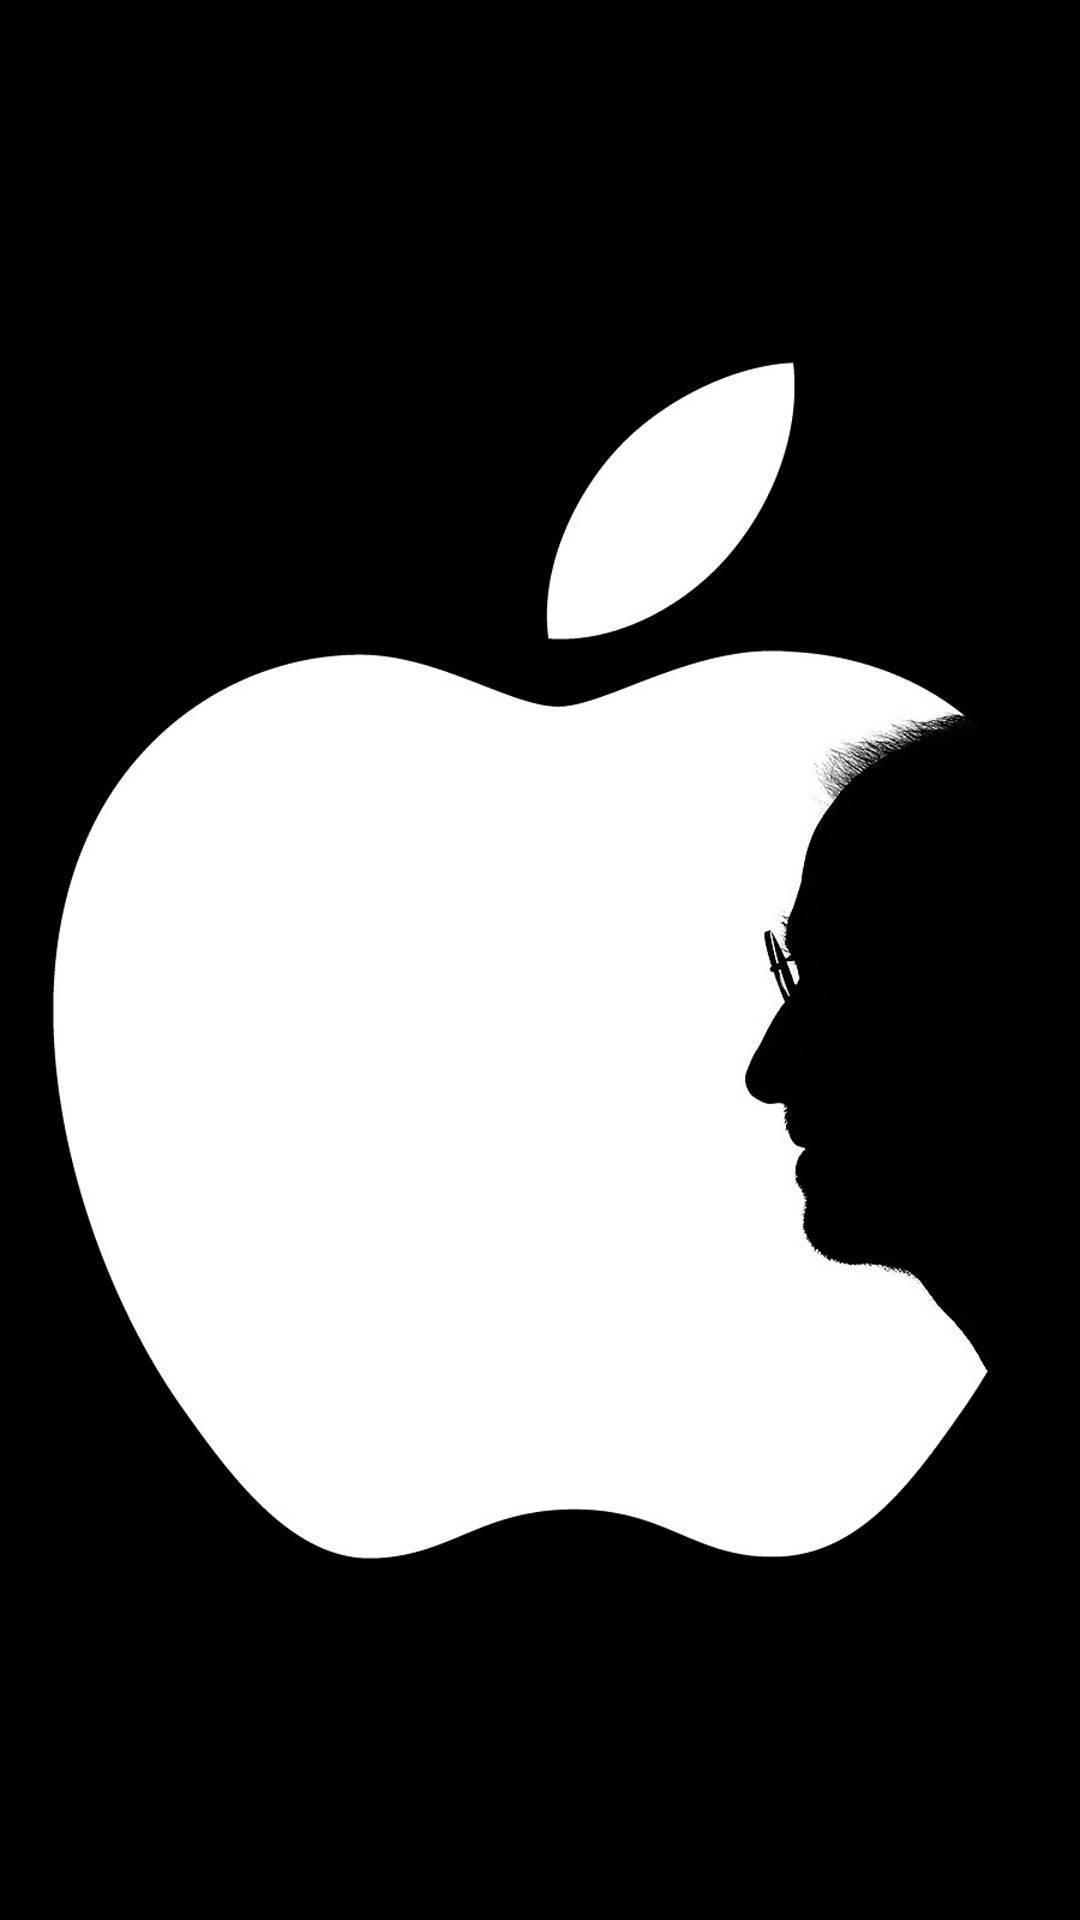 Iphone 6 Plus Black Wallpaper Steve Jobs Tribute Wallpapers For Iphone 6 And Iphone 6 Plus